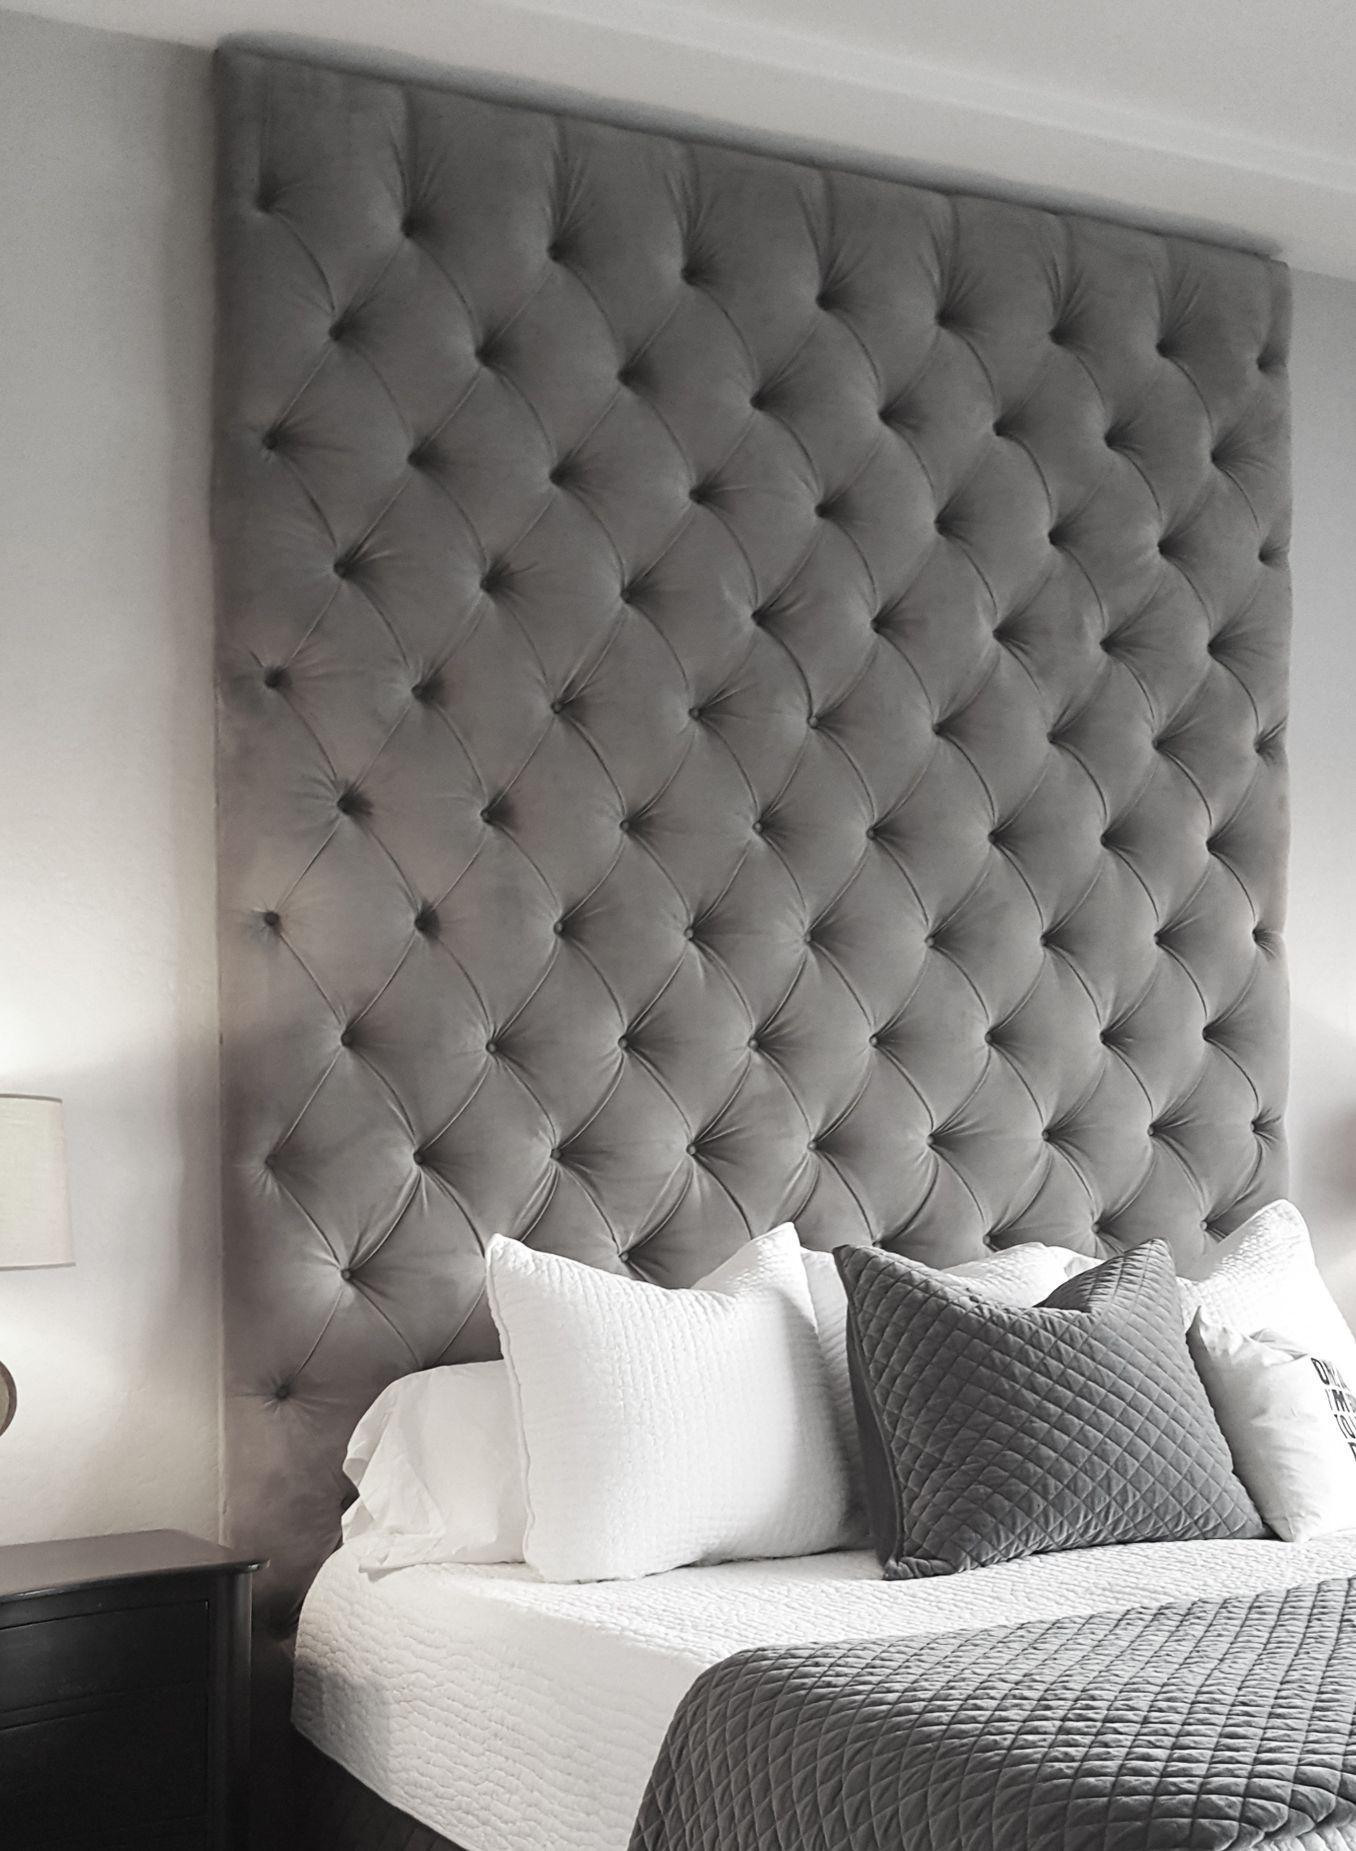 upholstered panel headboard on deep tufted wall panel upholstered walls upholstered wall panels wall panels bedroom deep tufted wall panel upholstered